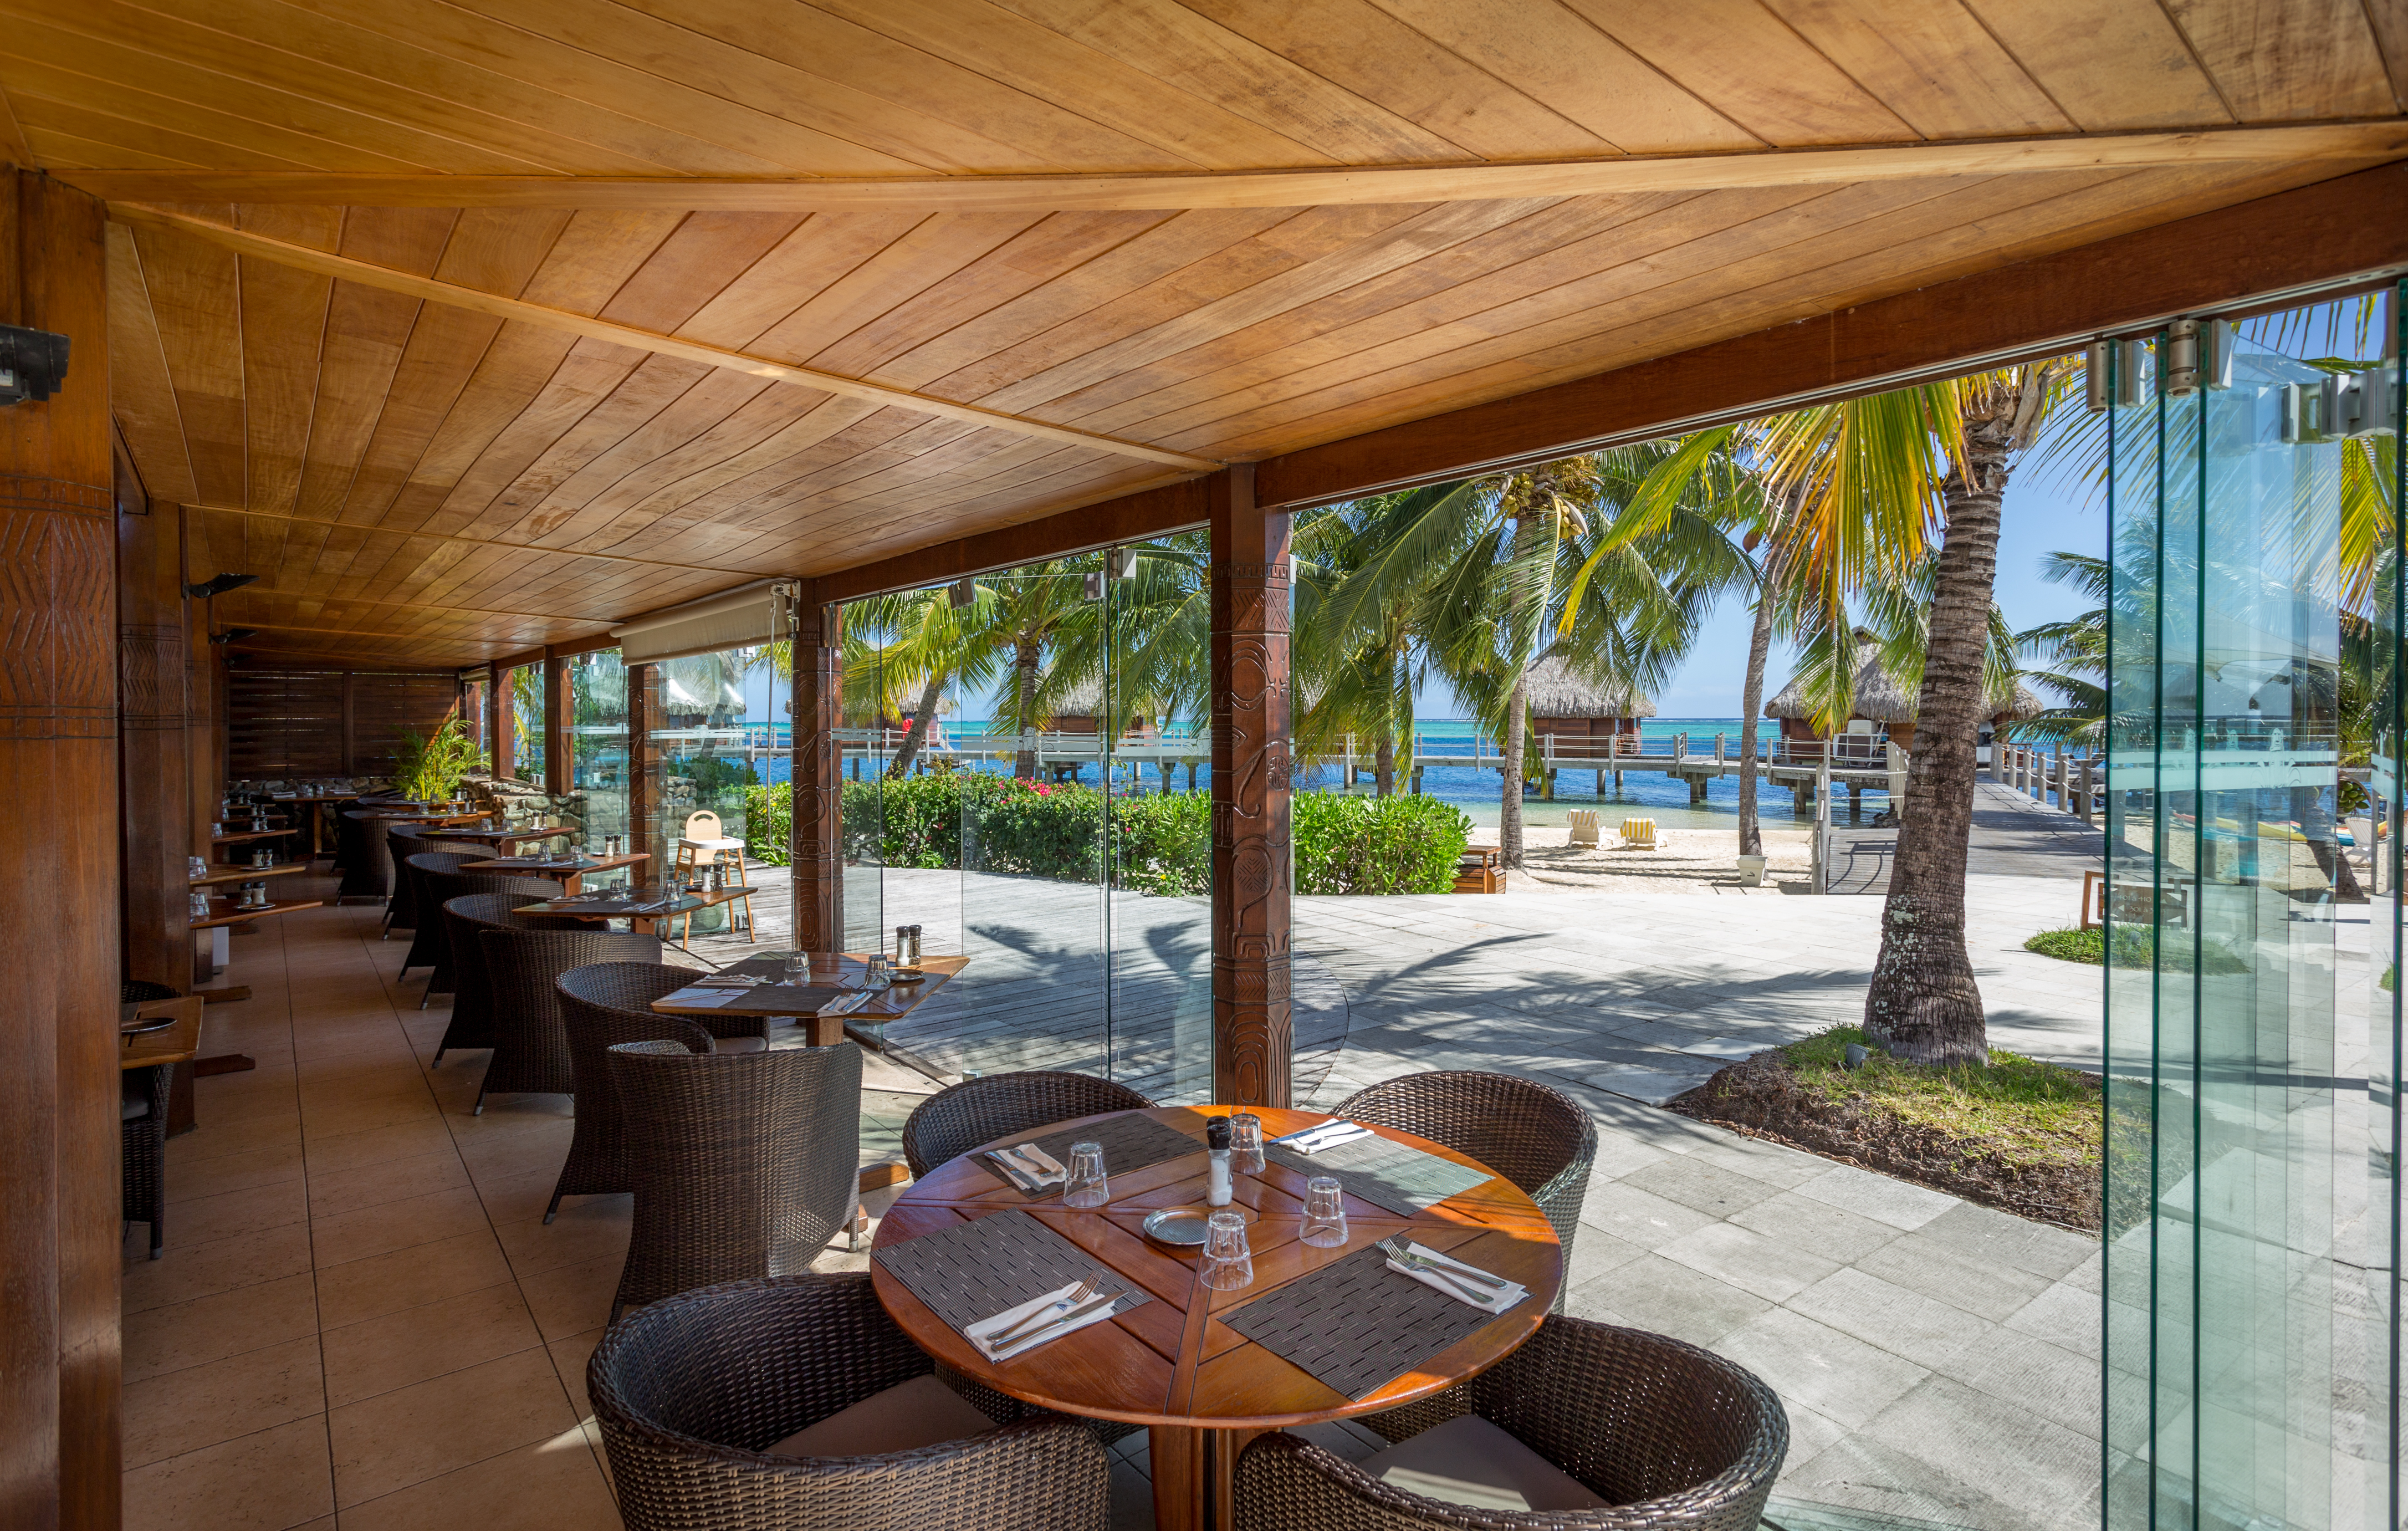 https://tahititourisme.jp/wp-content/uploads/2018/03/RESTAURATION-Restaurant-Mahanai-1-Charles_Veronese.jpg